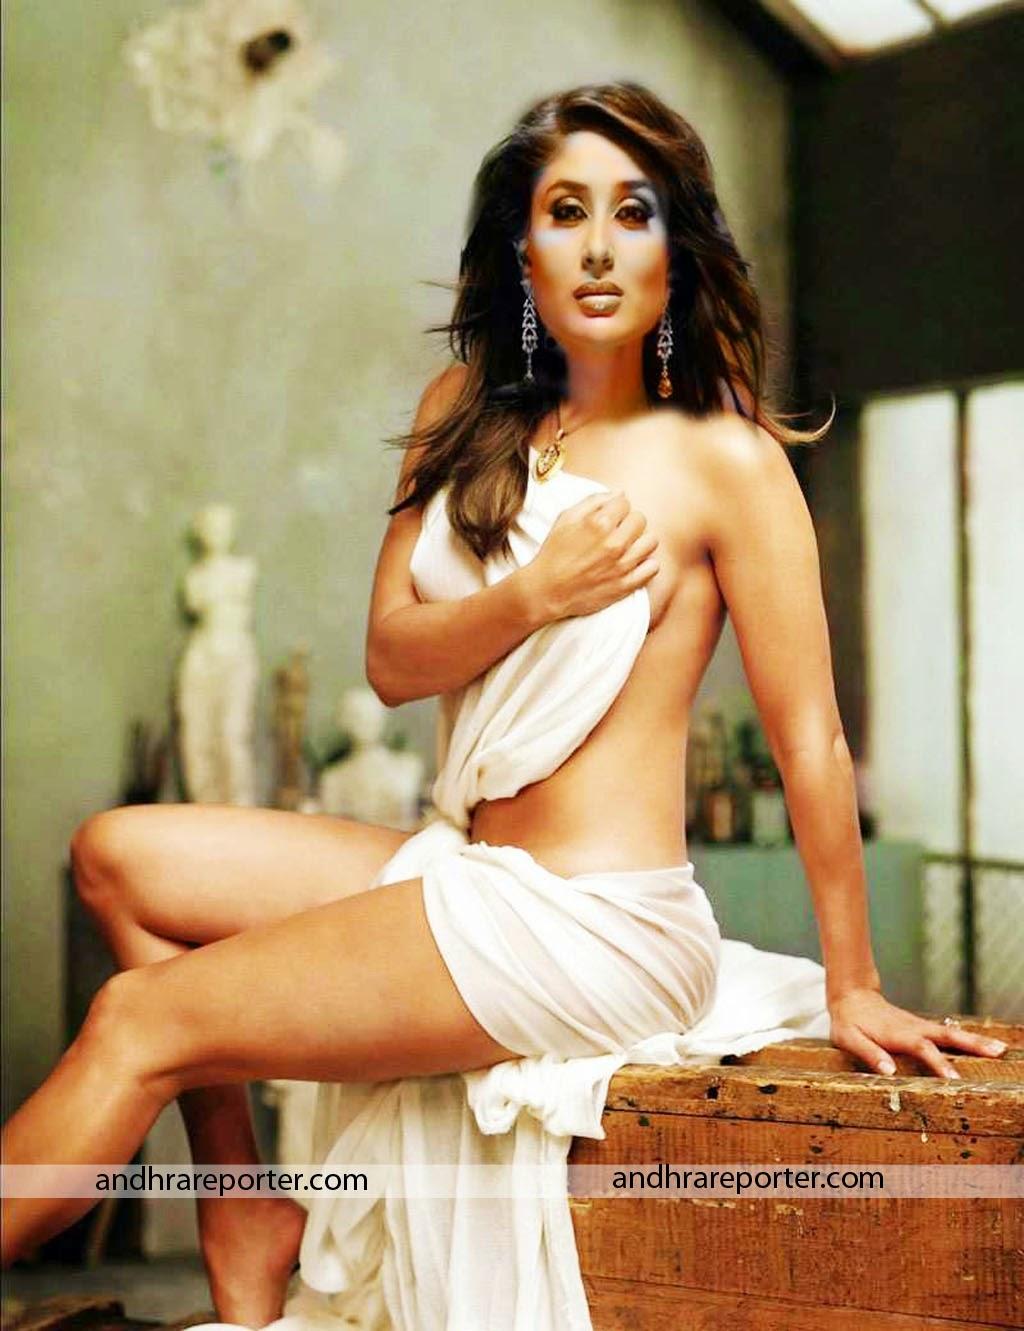 Bollywood Actress Karenna Kapoor Full Hd Wallpaper Hot Photos Full Hd 1080 Size Wallpaper Hd Images Hd Photos 2015 Bollywood Actress Karenna Kapoor Full